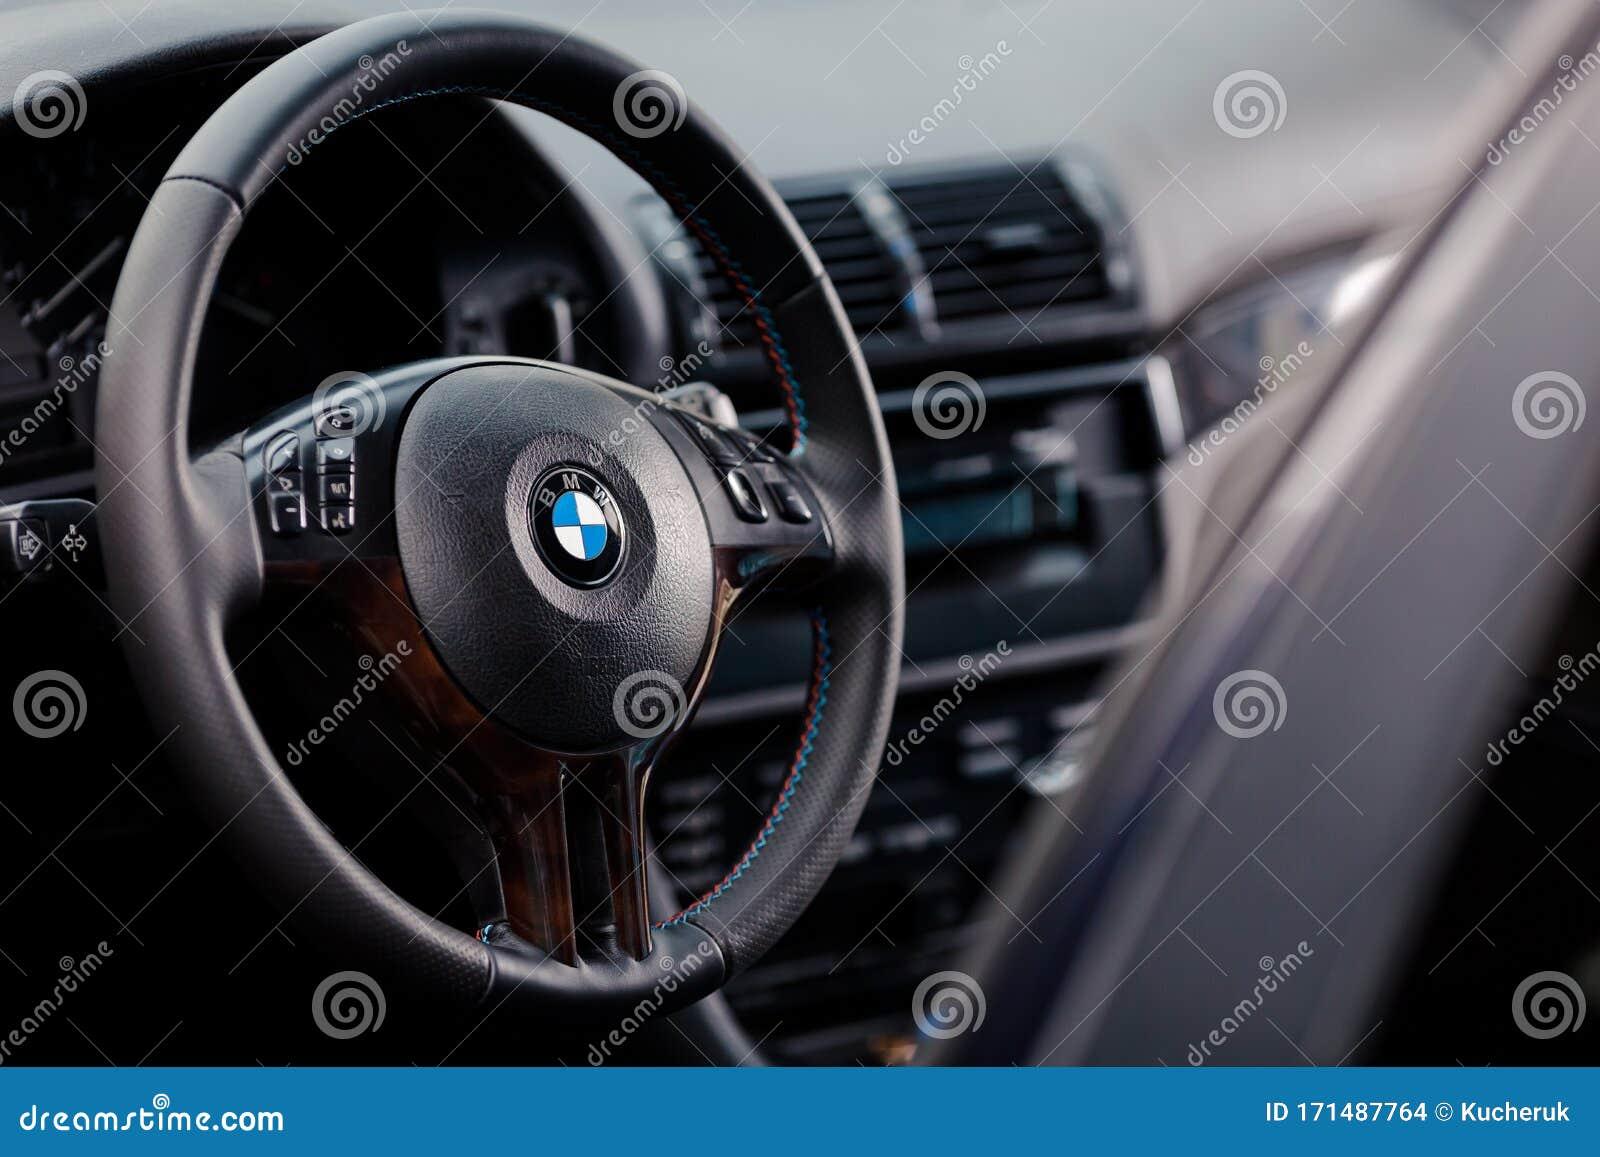 Bavaria, Germany - January 23, 2020: Original BMW 5 Series ... - photo#13